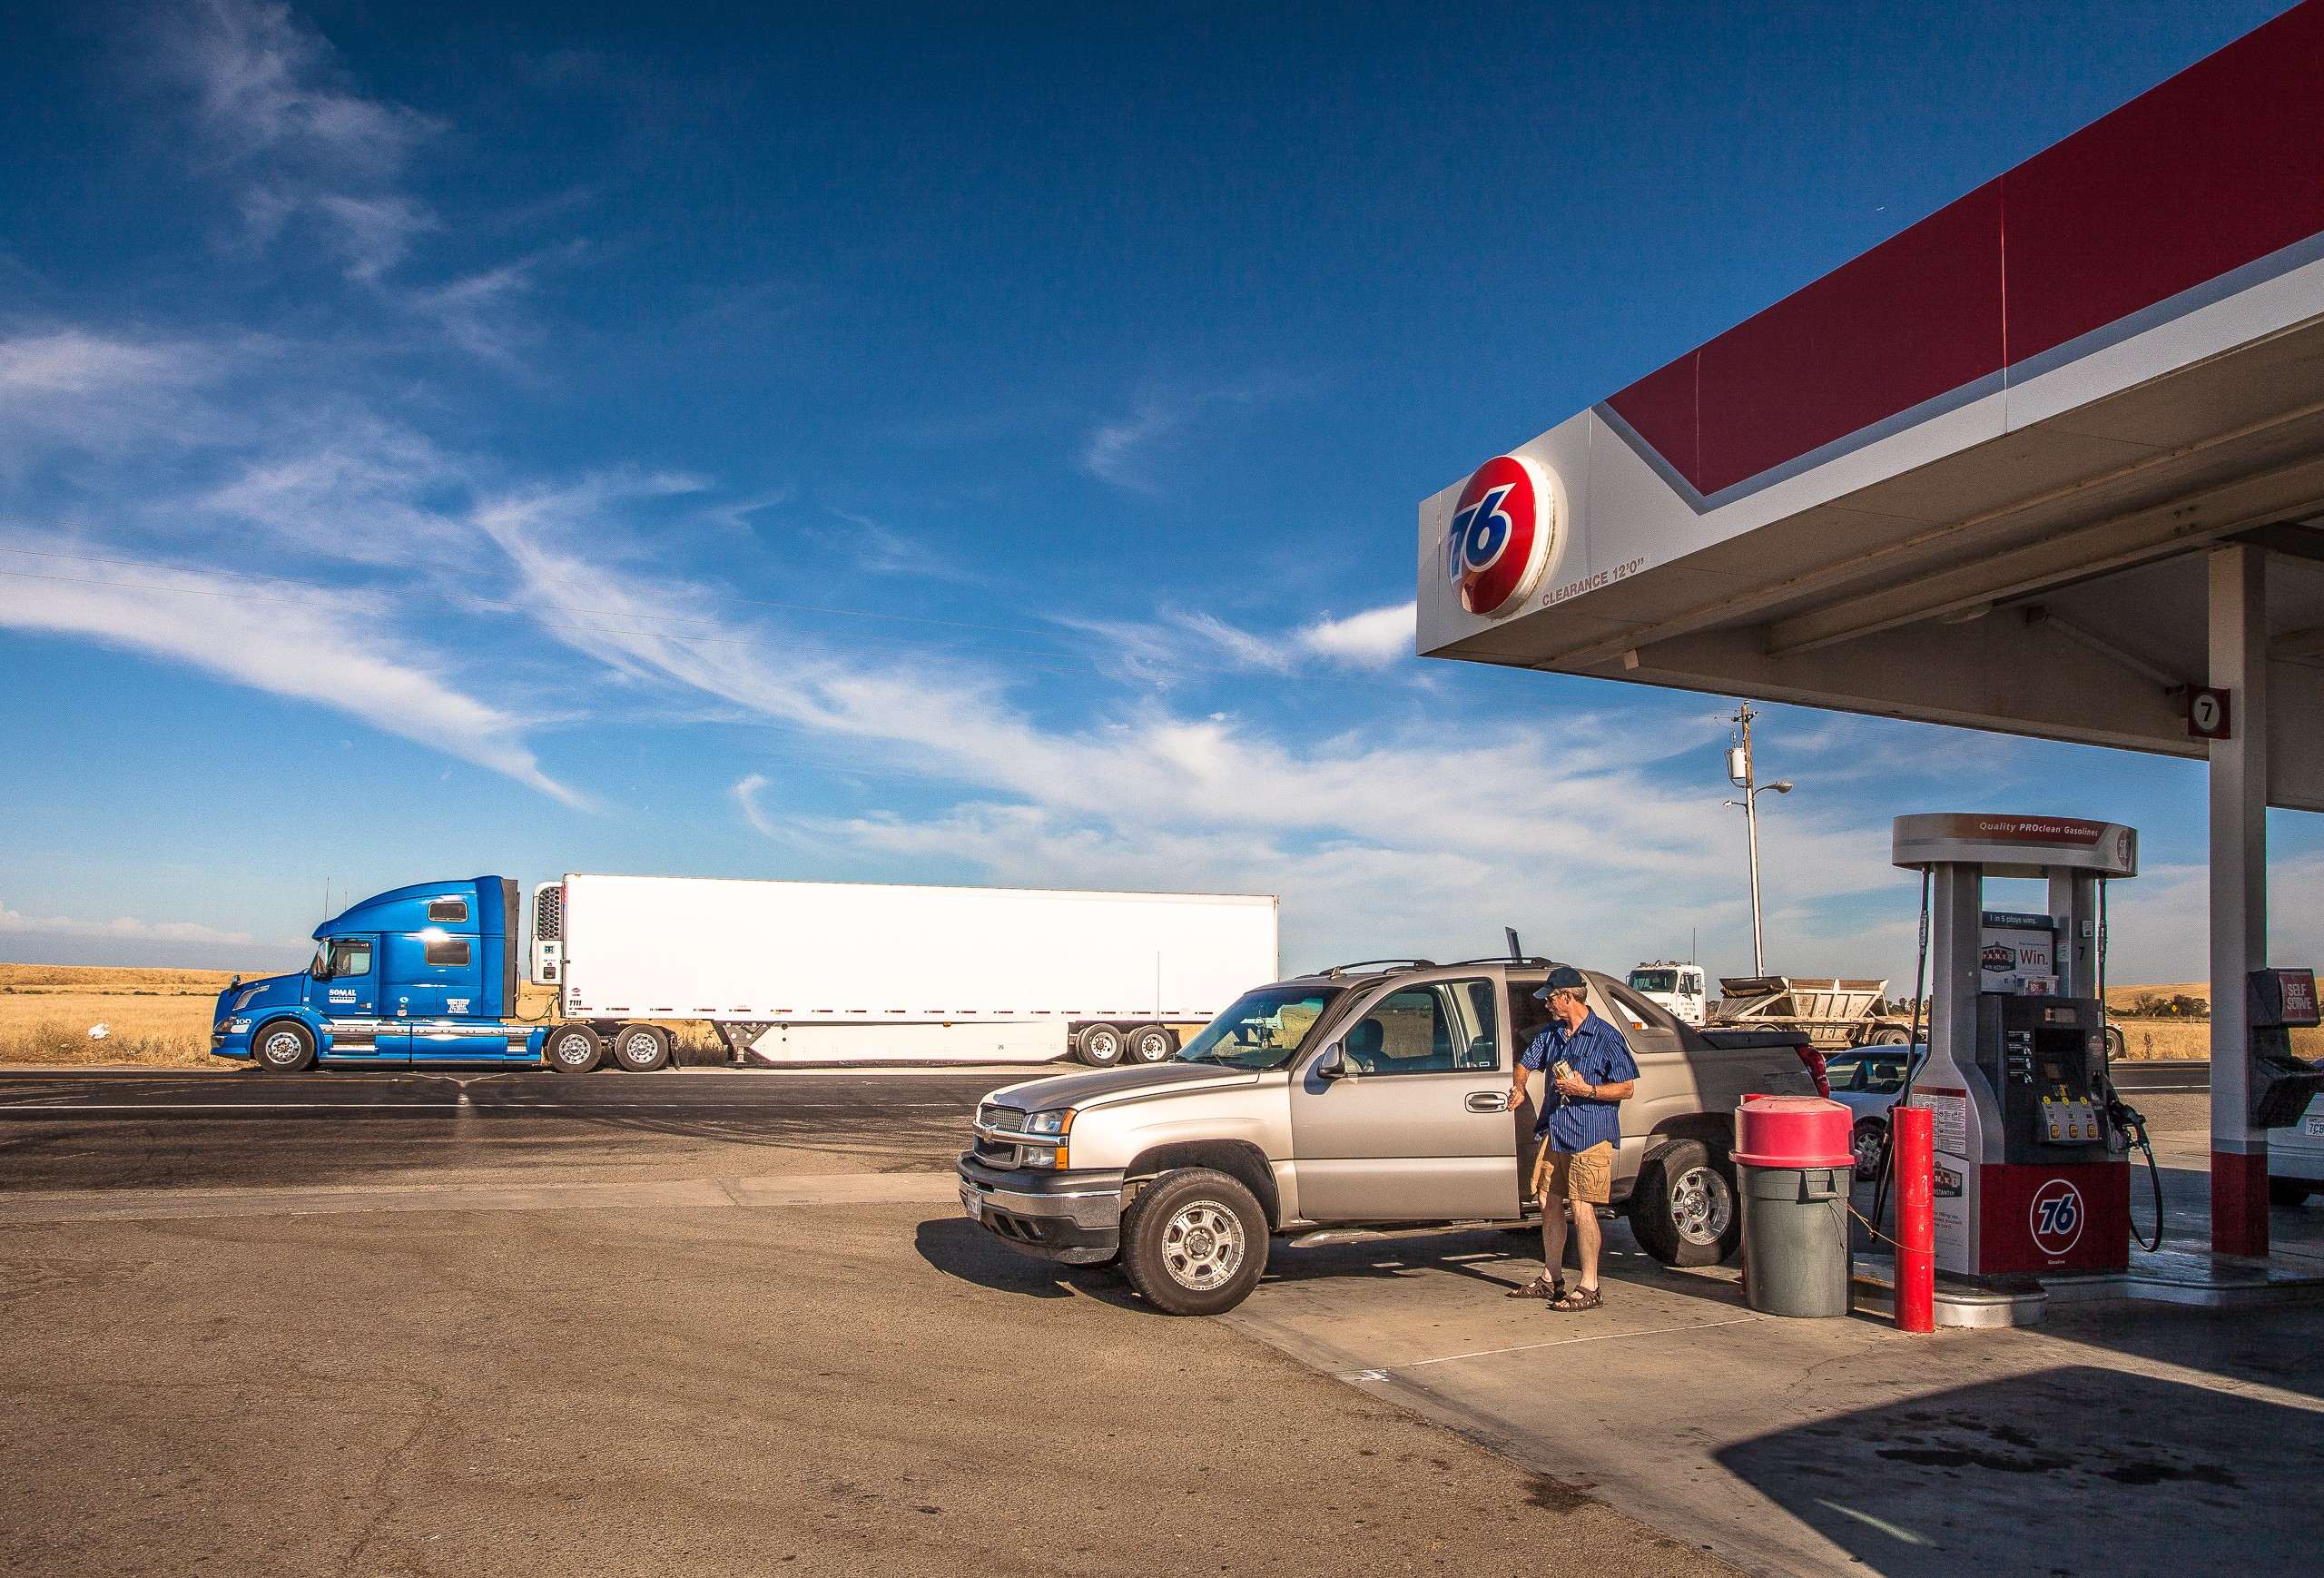 An American Truck Stop